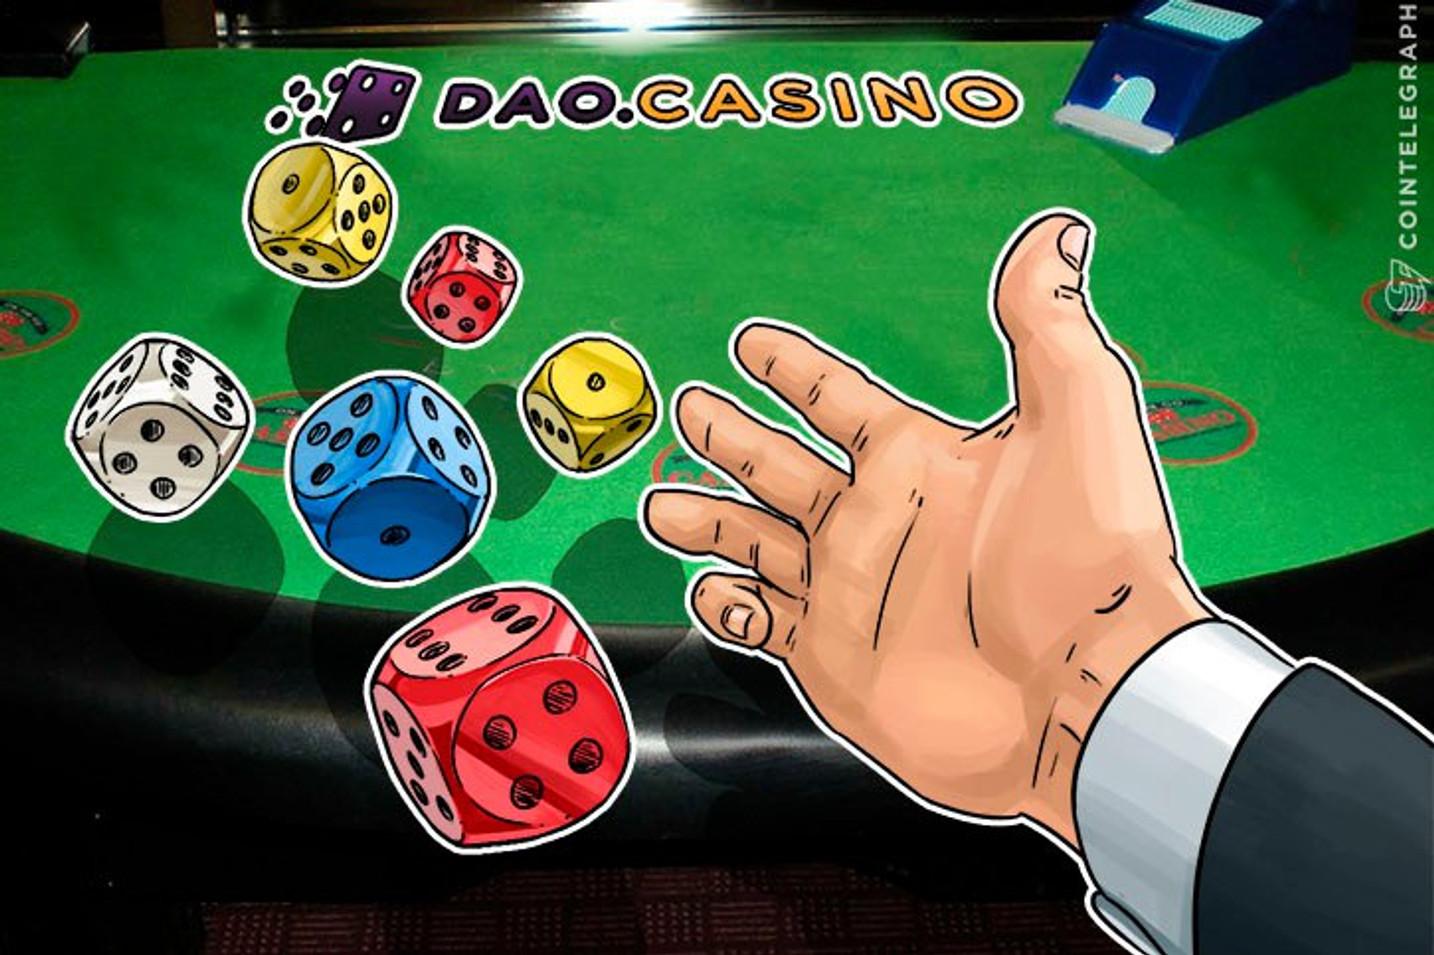 Prototype for Blockchain-Based Gambling Protocol Released